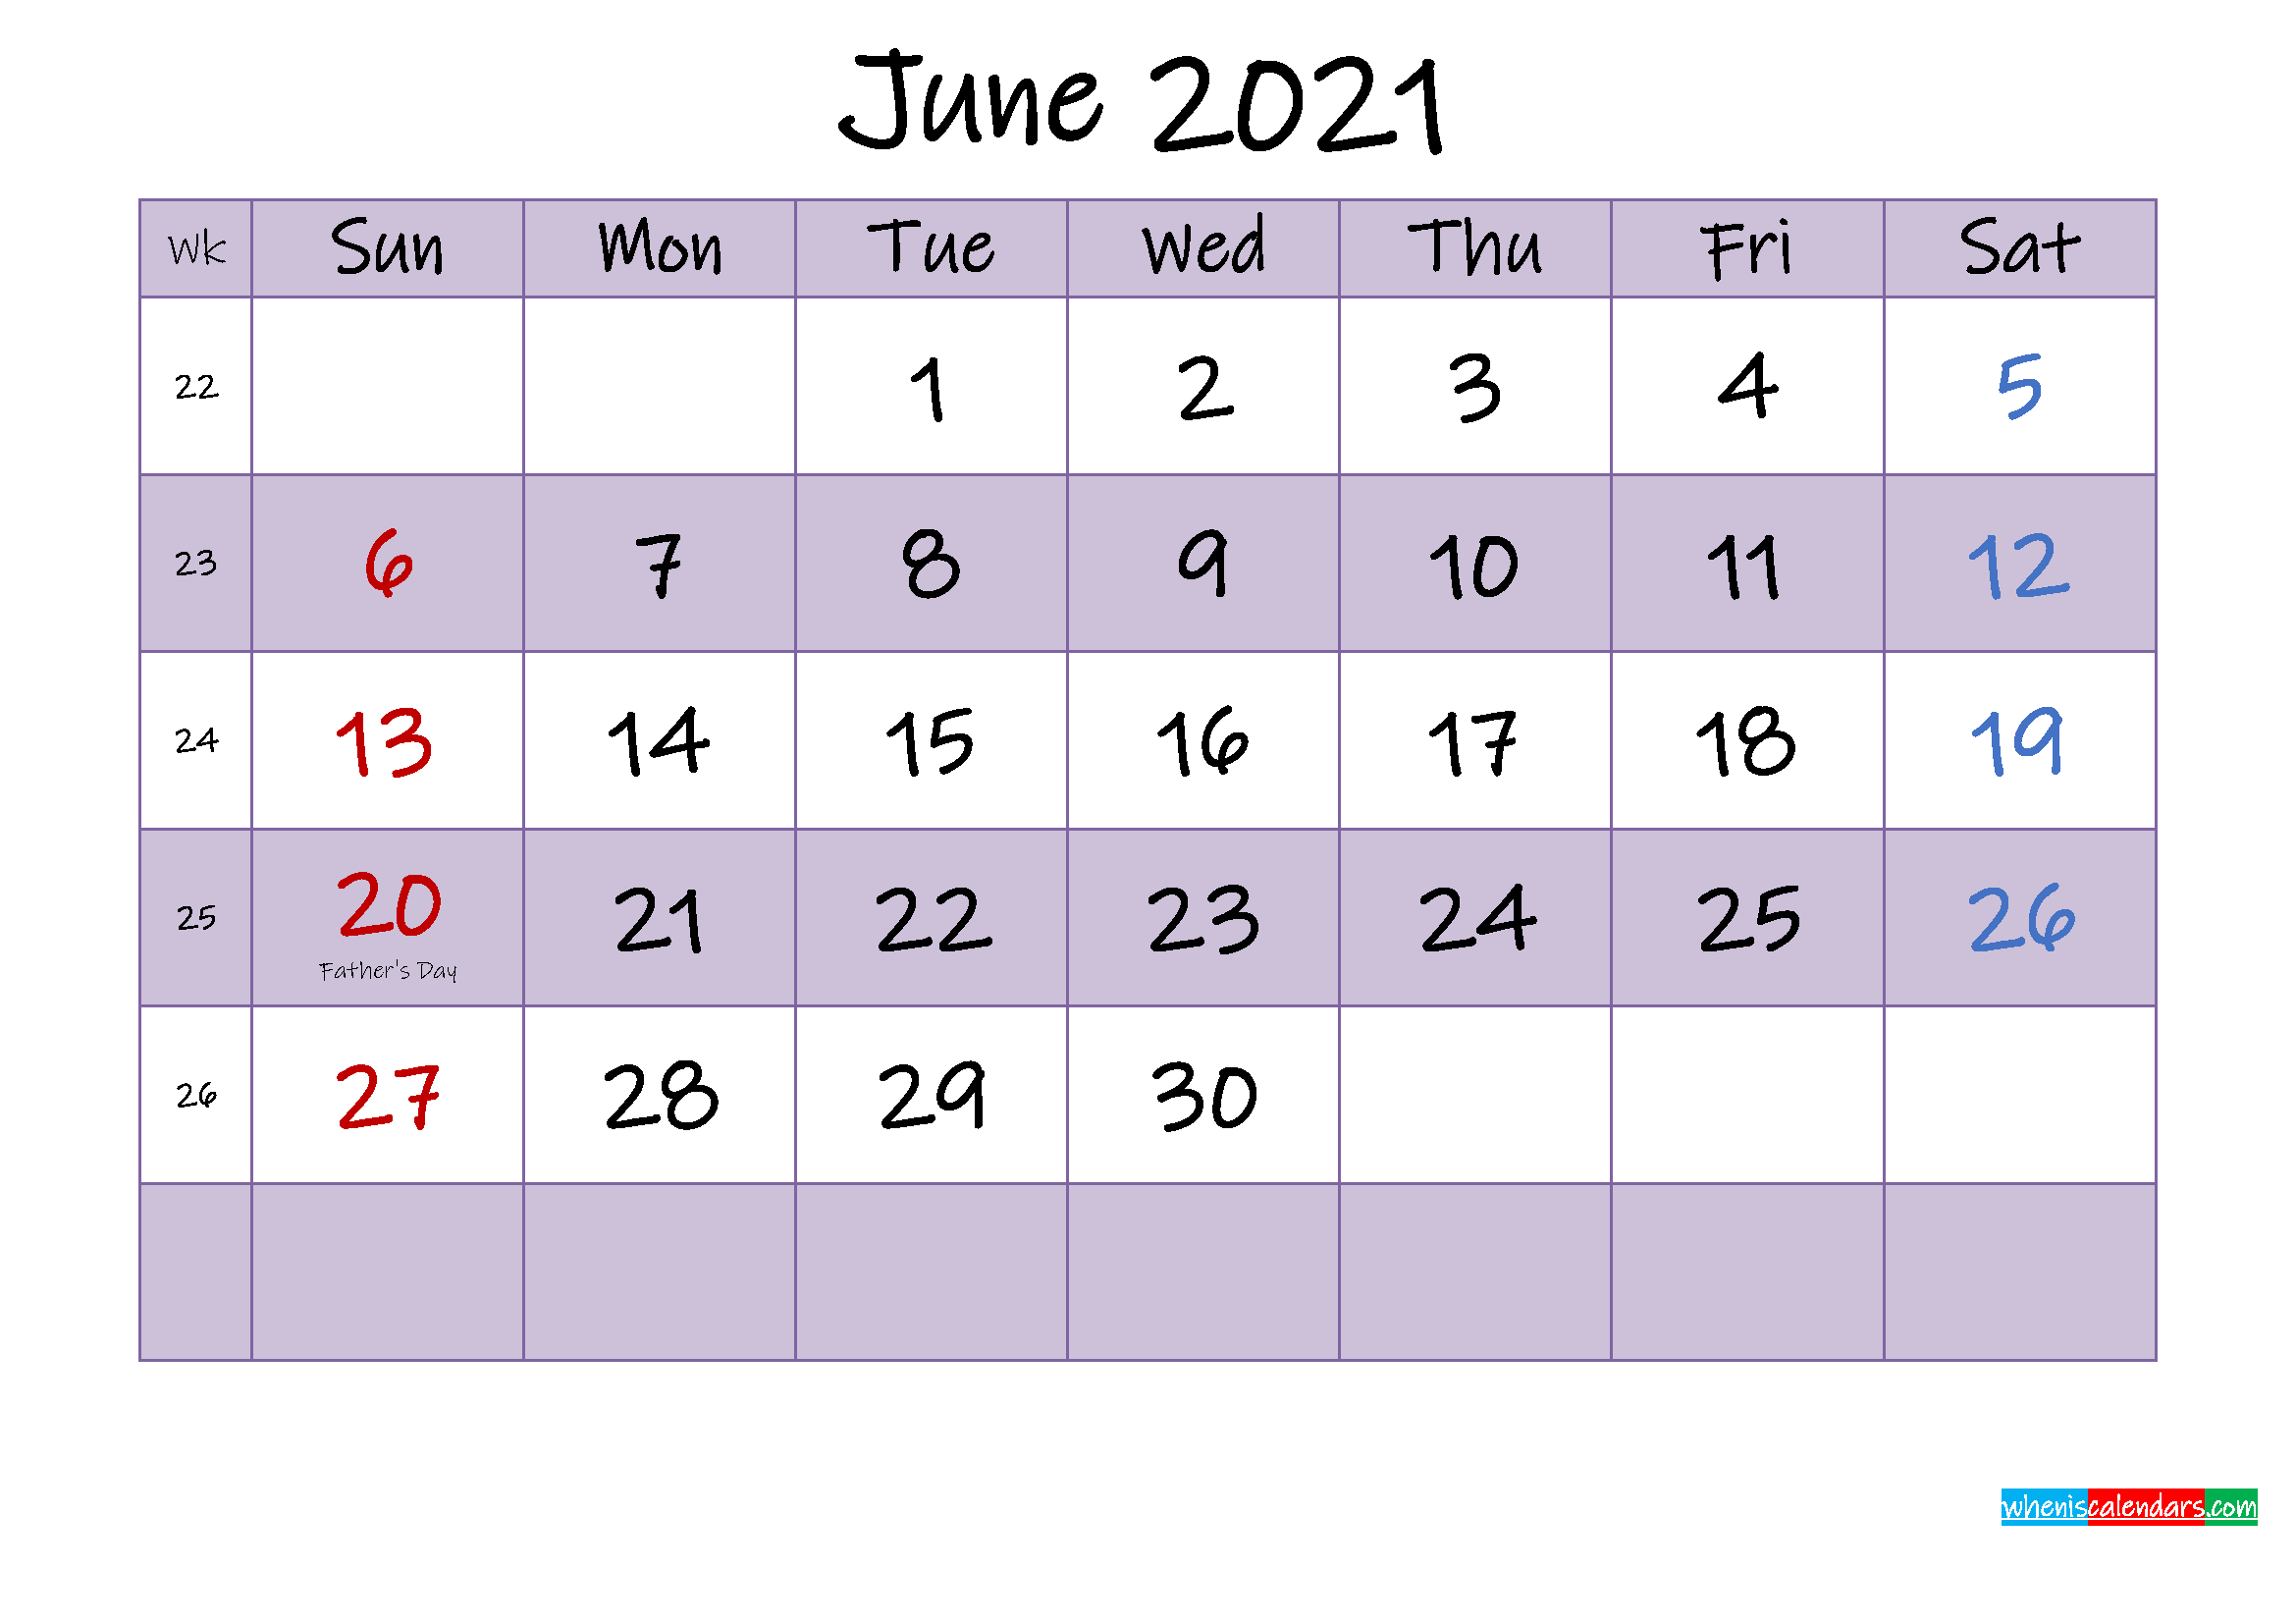 Editable June 2021 Calendar - Template No.ink21m462 | Free ...